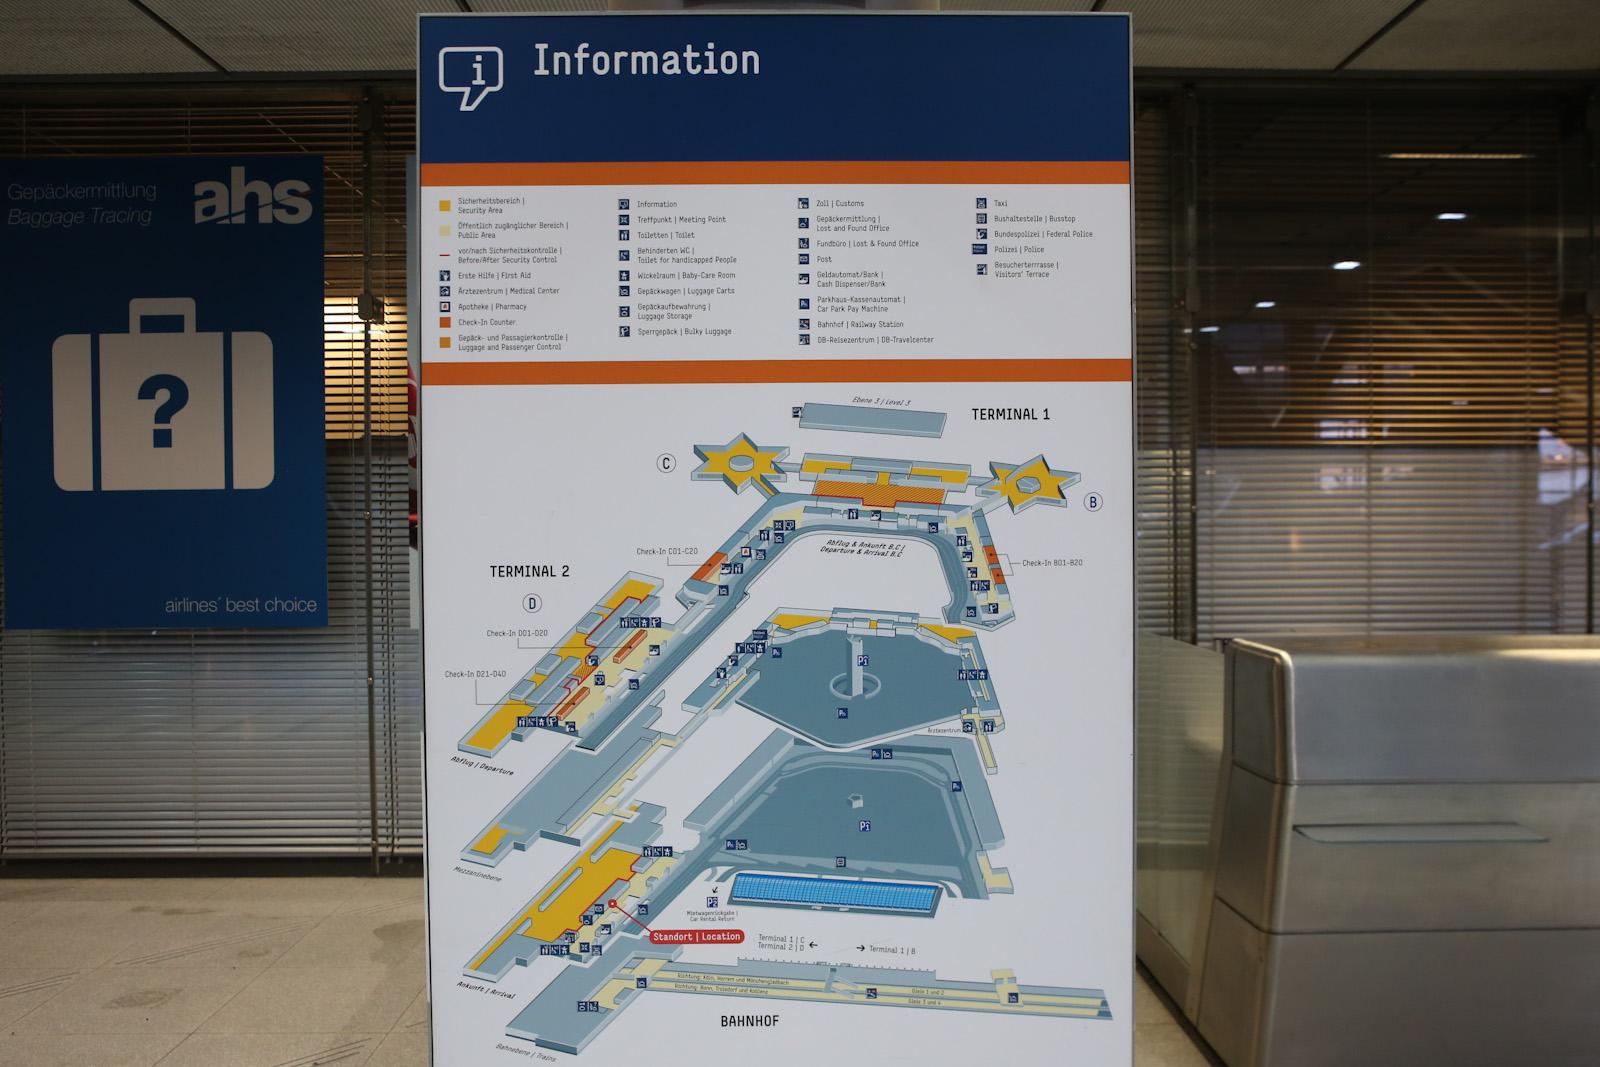 Схема терминалов аэропорта Кёльн/Бонн